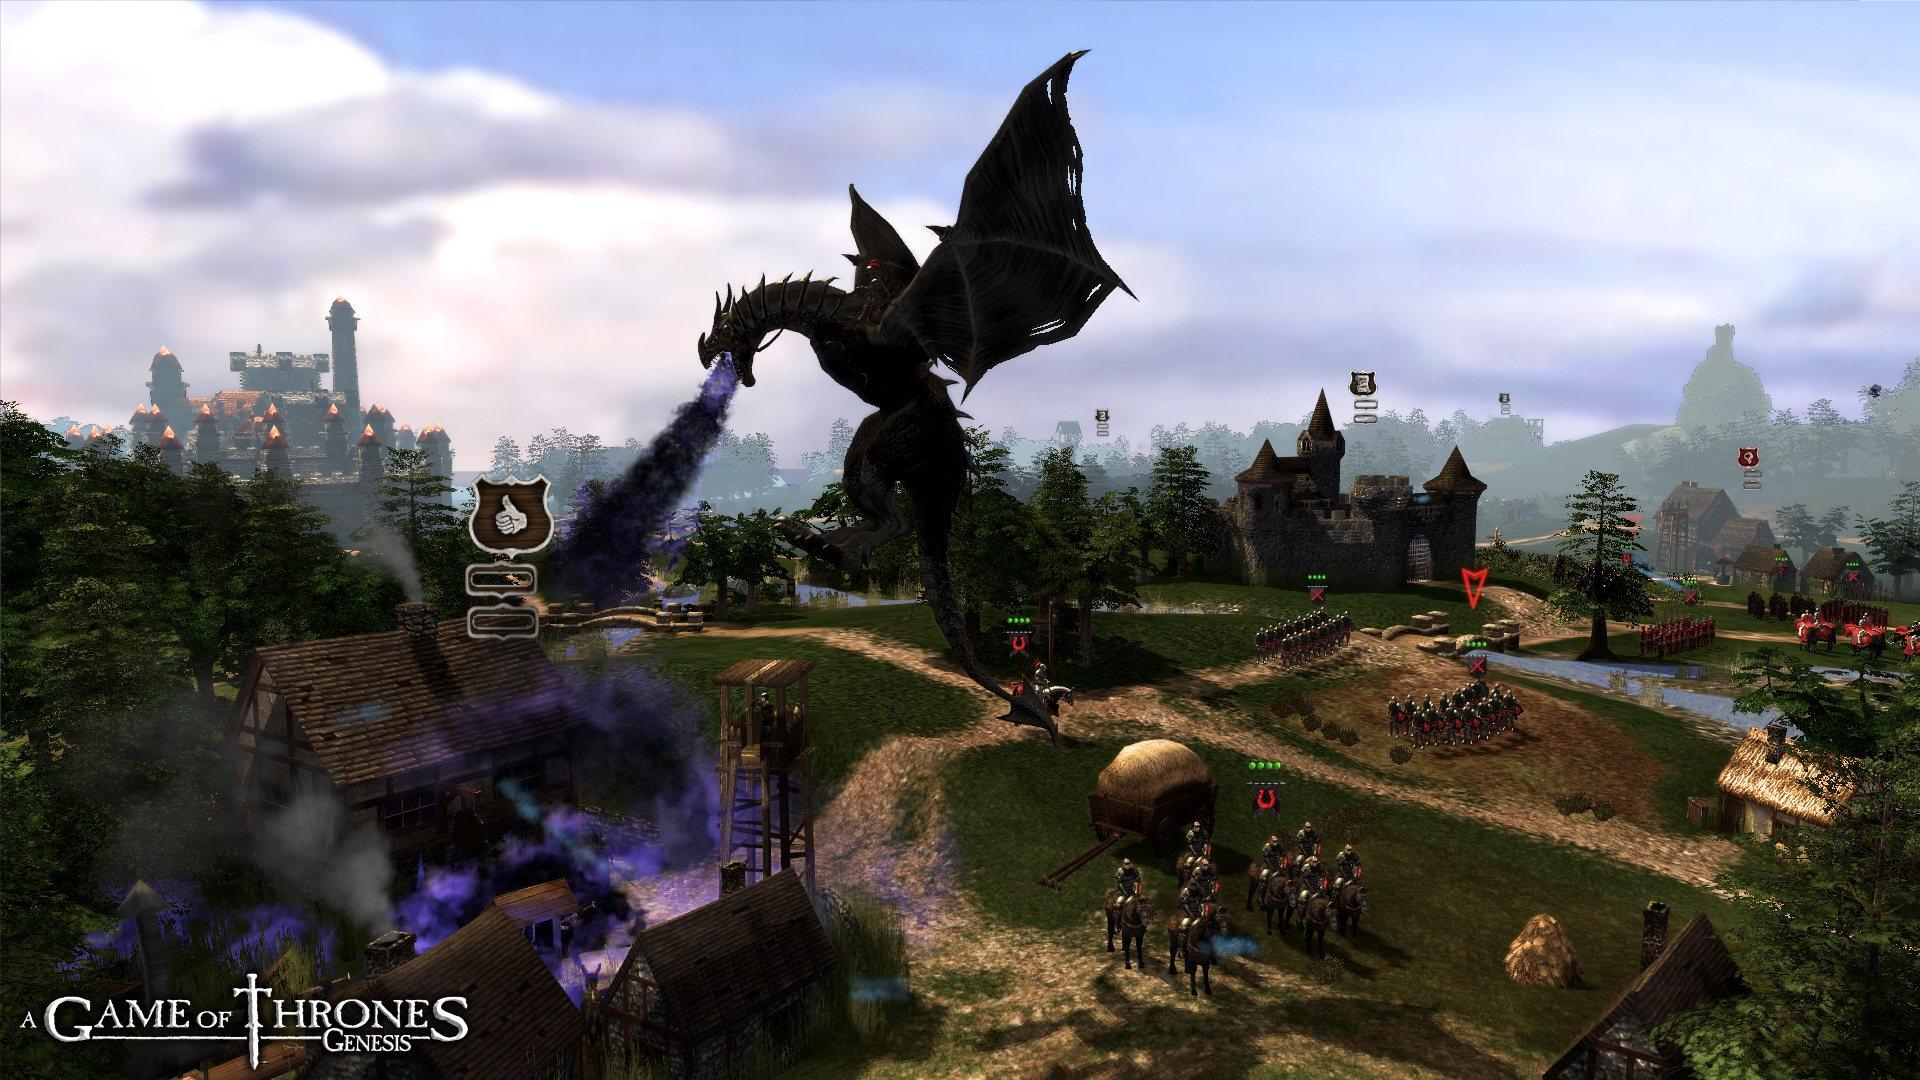 A Game of Thrones: Genesis - Gameplay